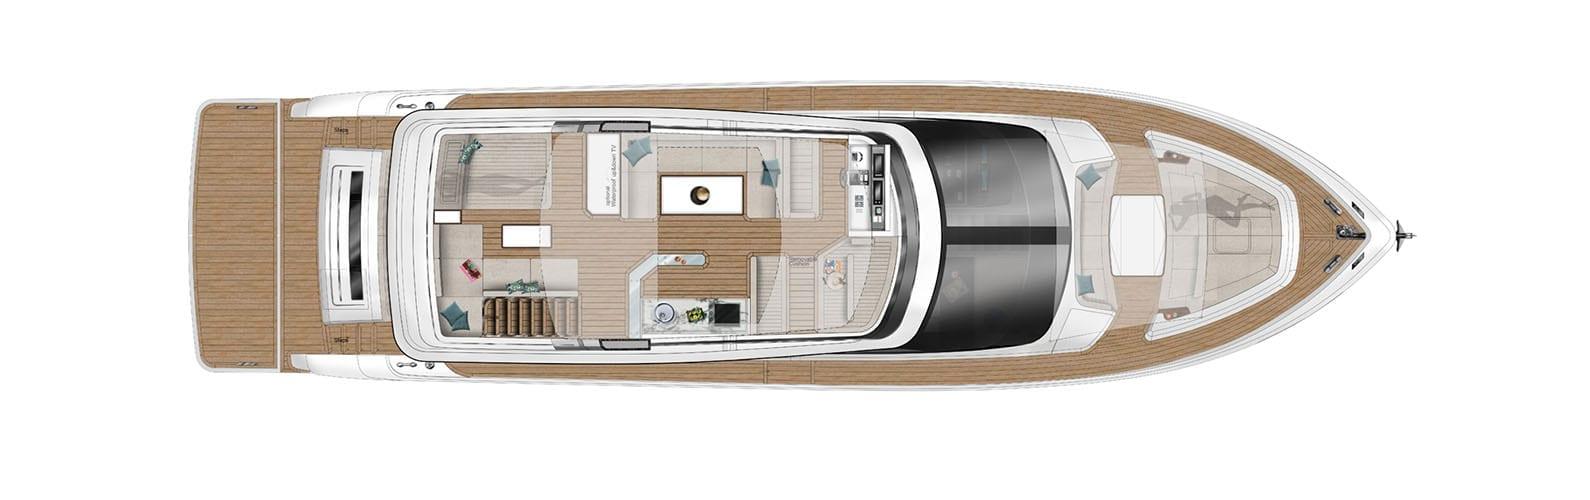 Uniesse-Capri-7-footprint-3